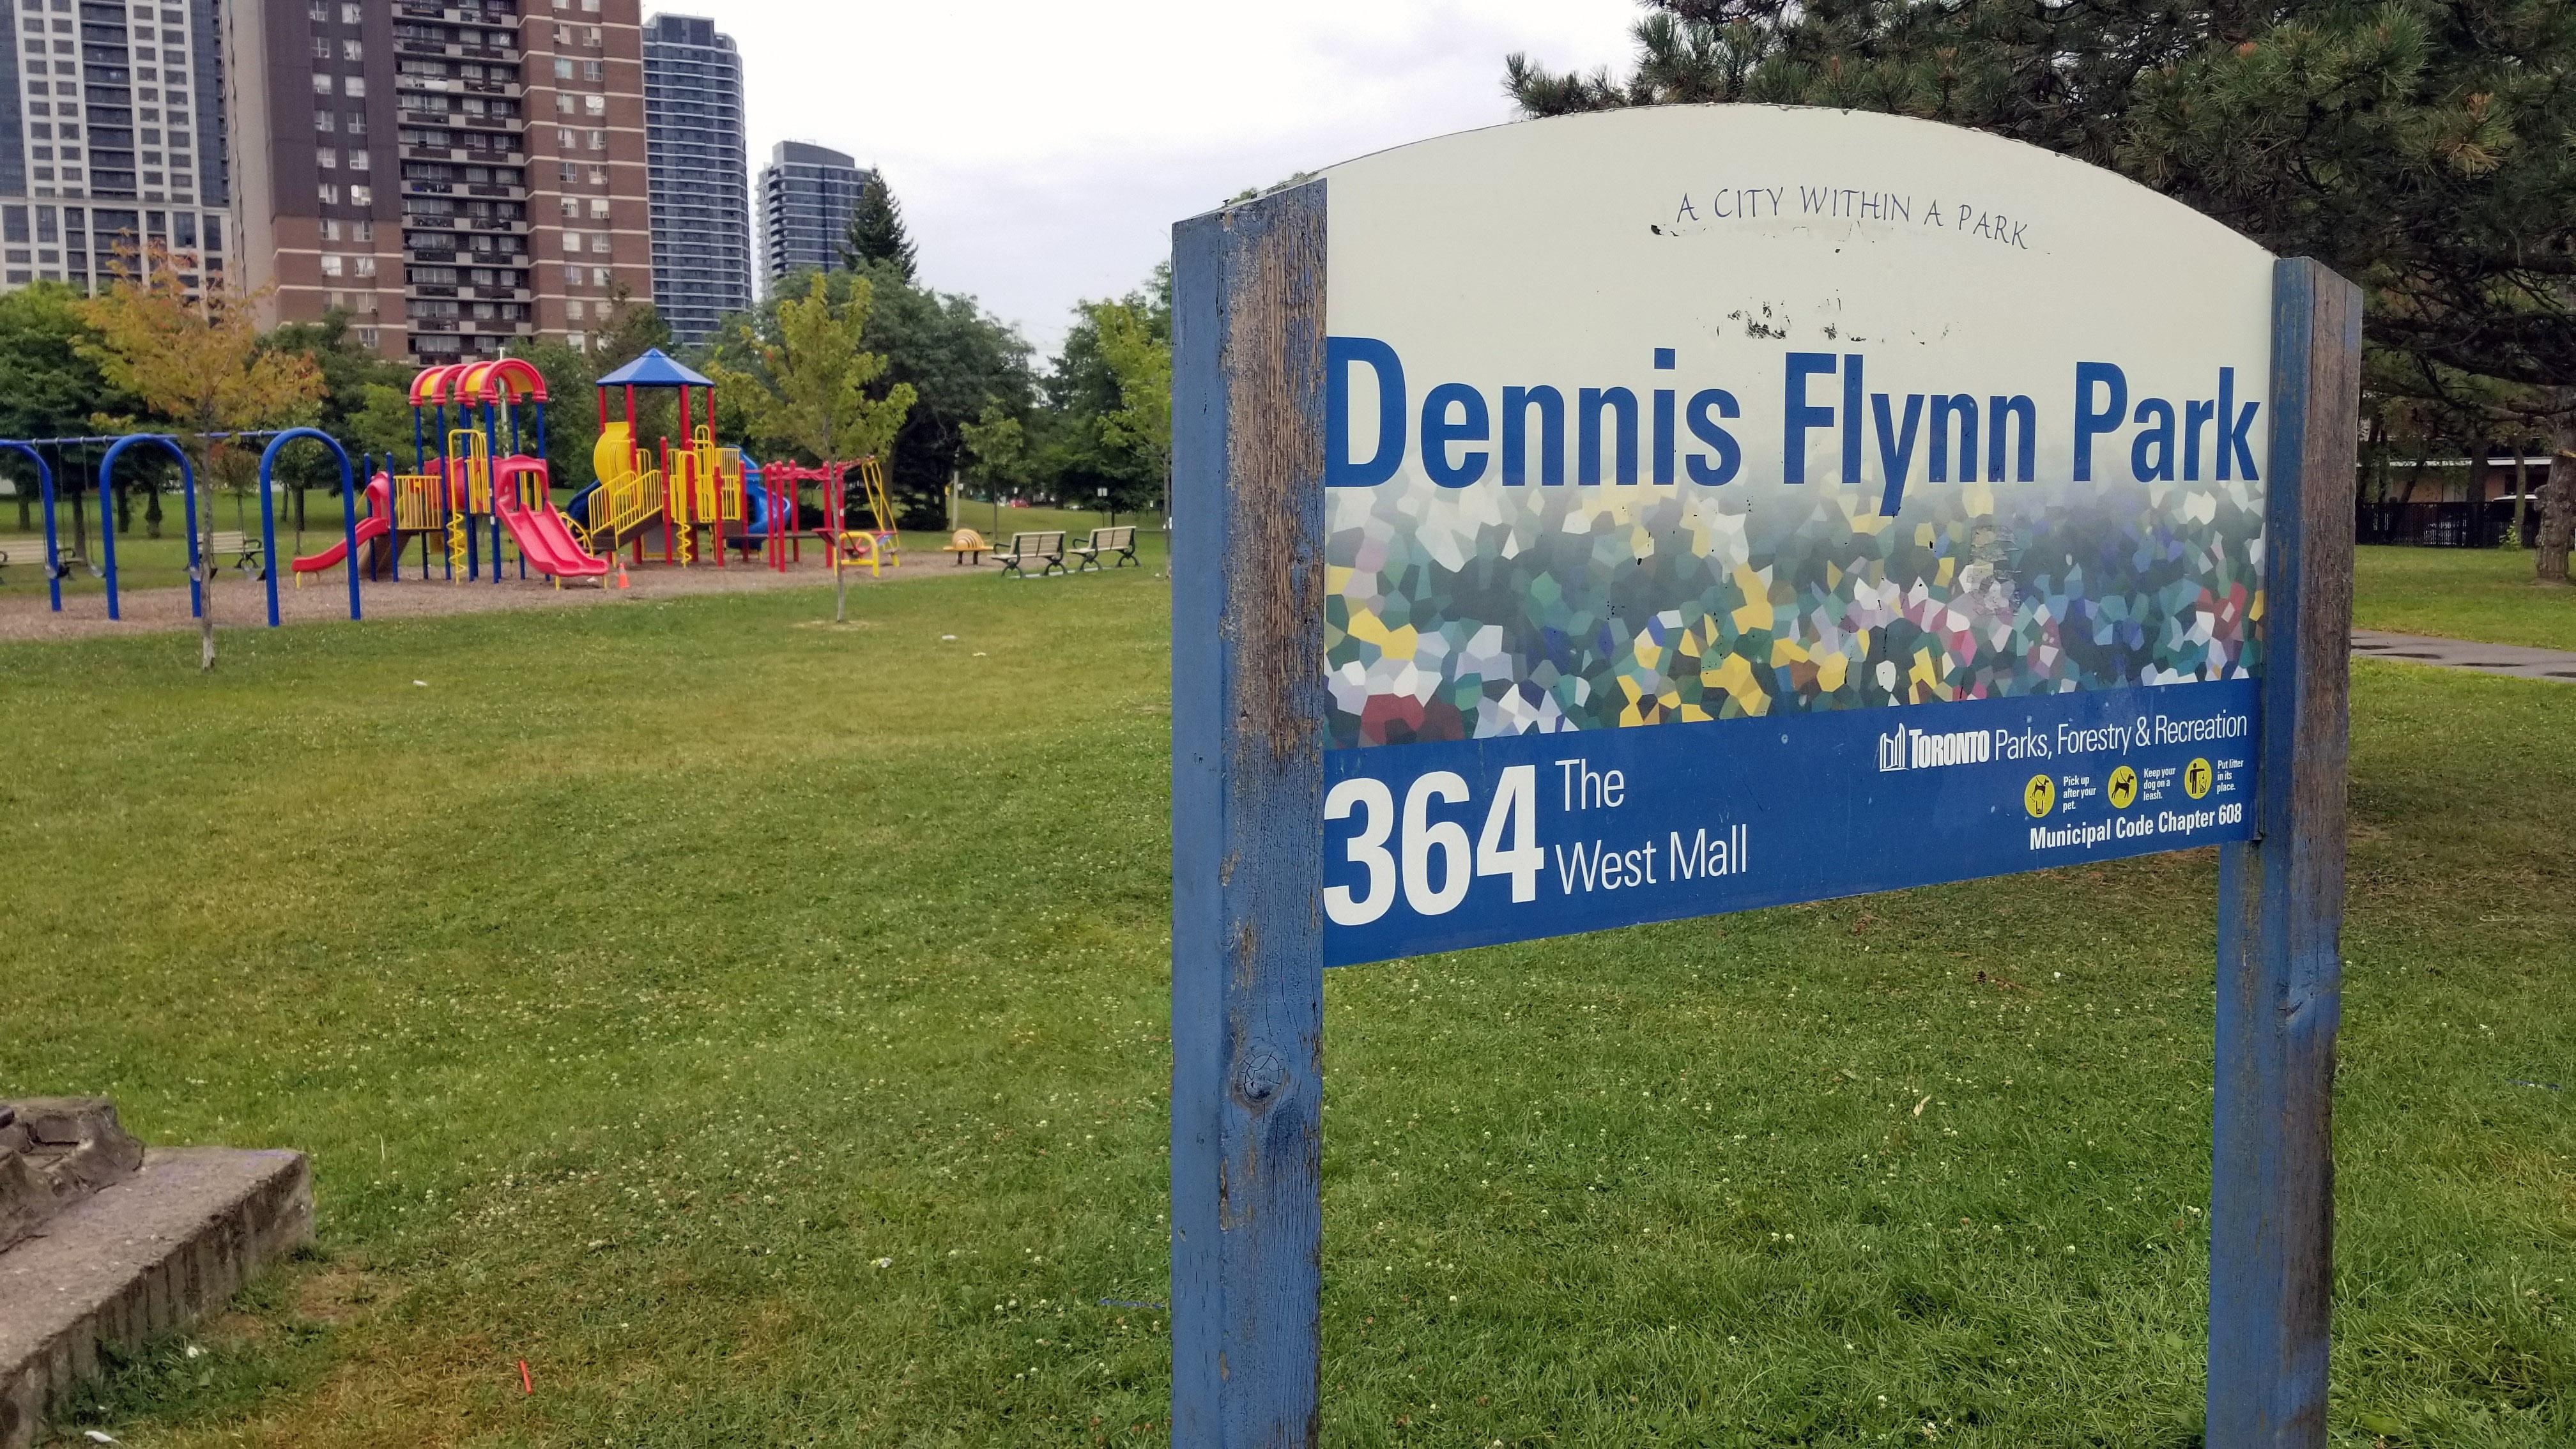 Toronto police investigating hateful anti-Muslim graffiti